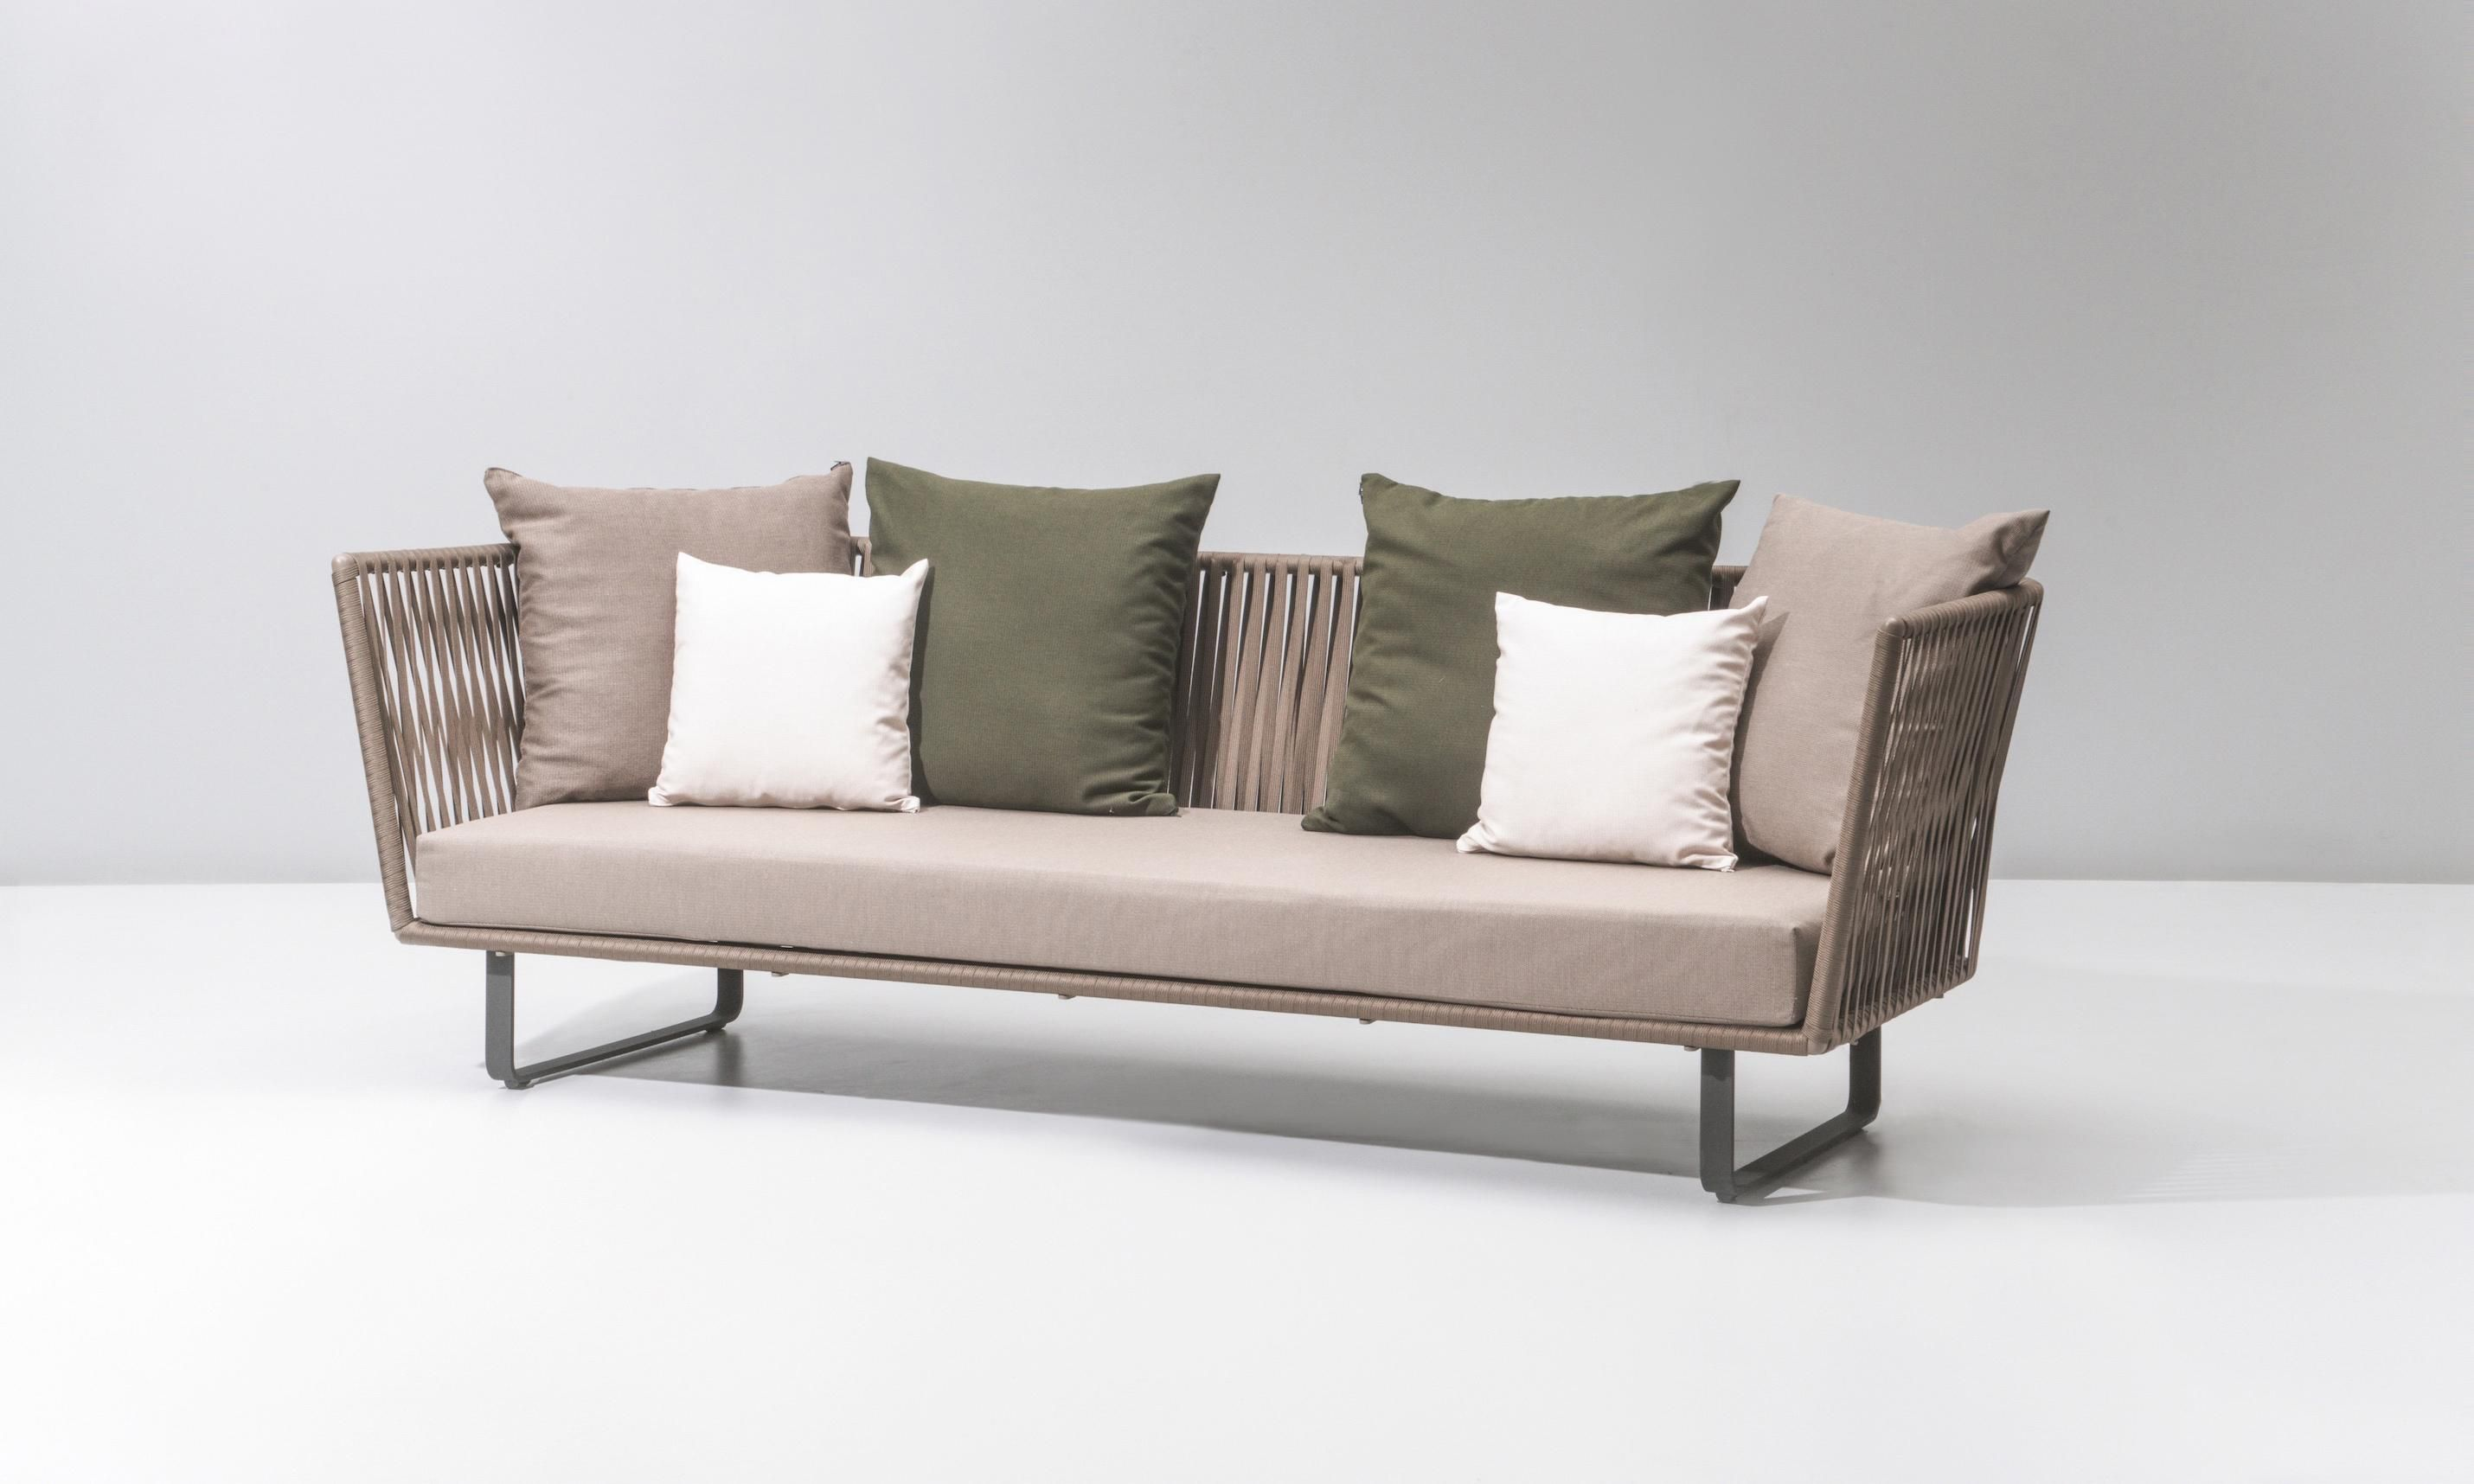 emejing mobilier de jardin kettal contemporary amazing. Black Bedroom Furniture Sets. Home Design Ideas